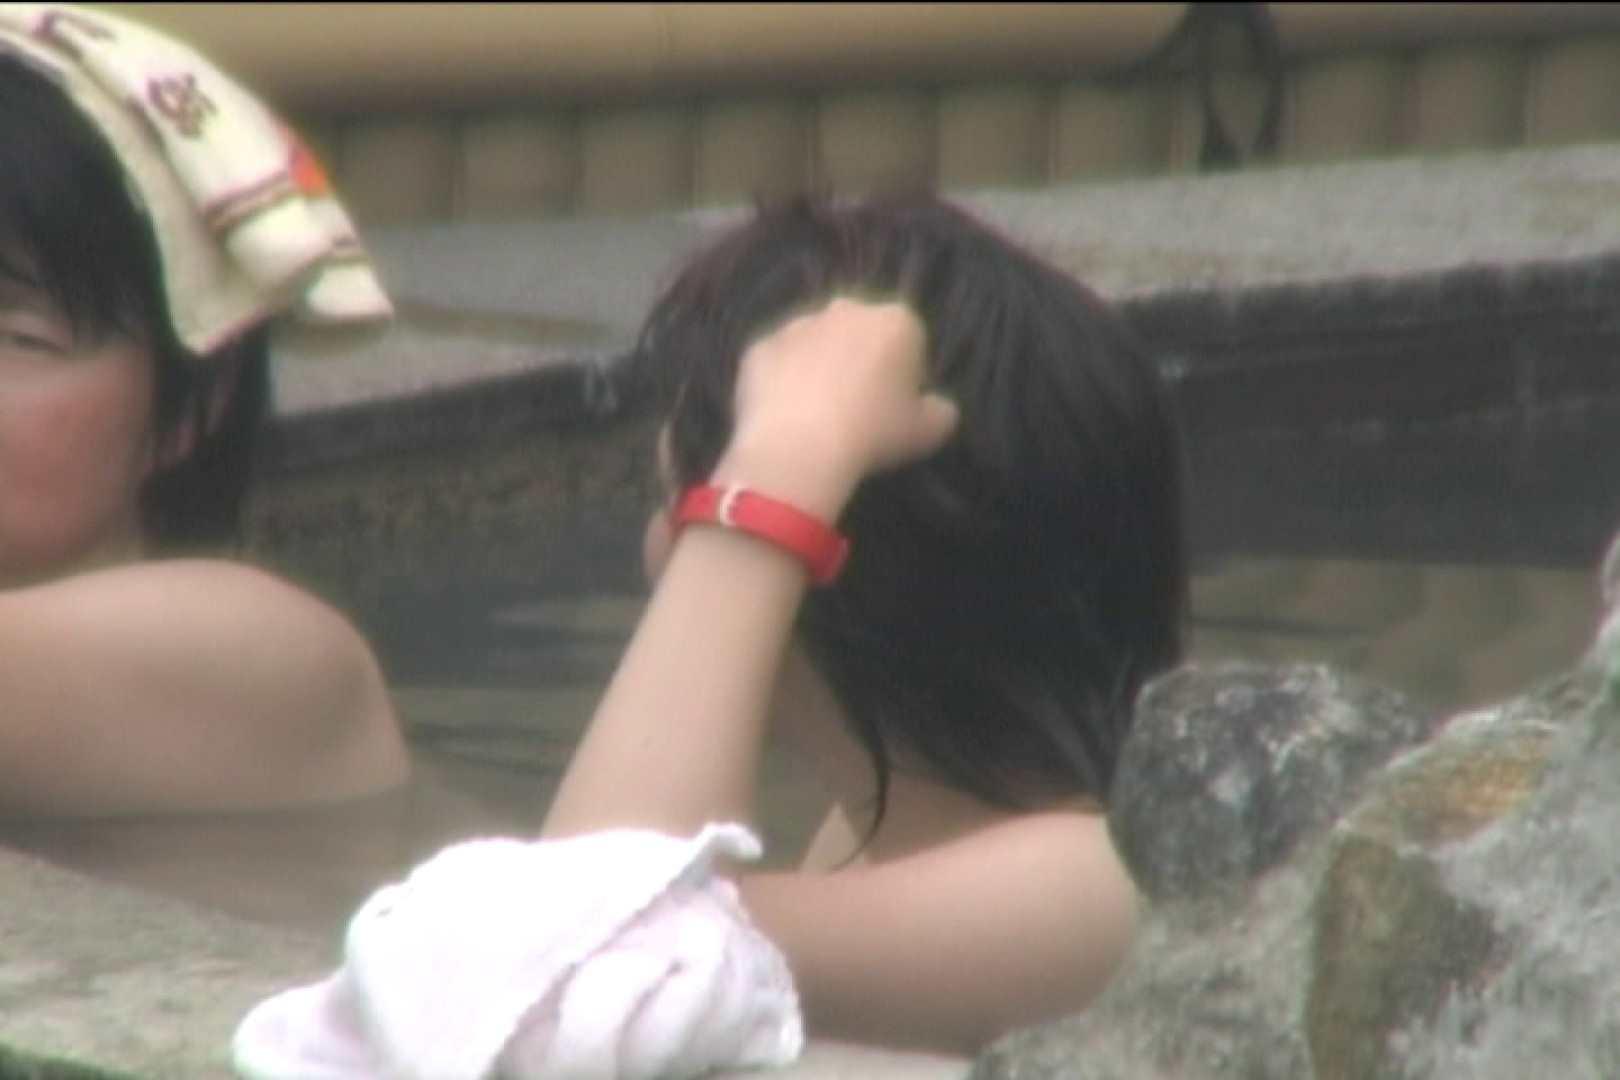 Aquaな露天風呂Vol.122 HなOL   0  107pic 89